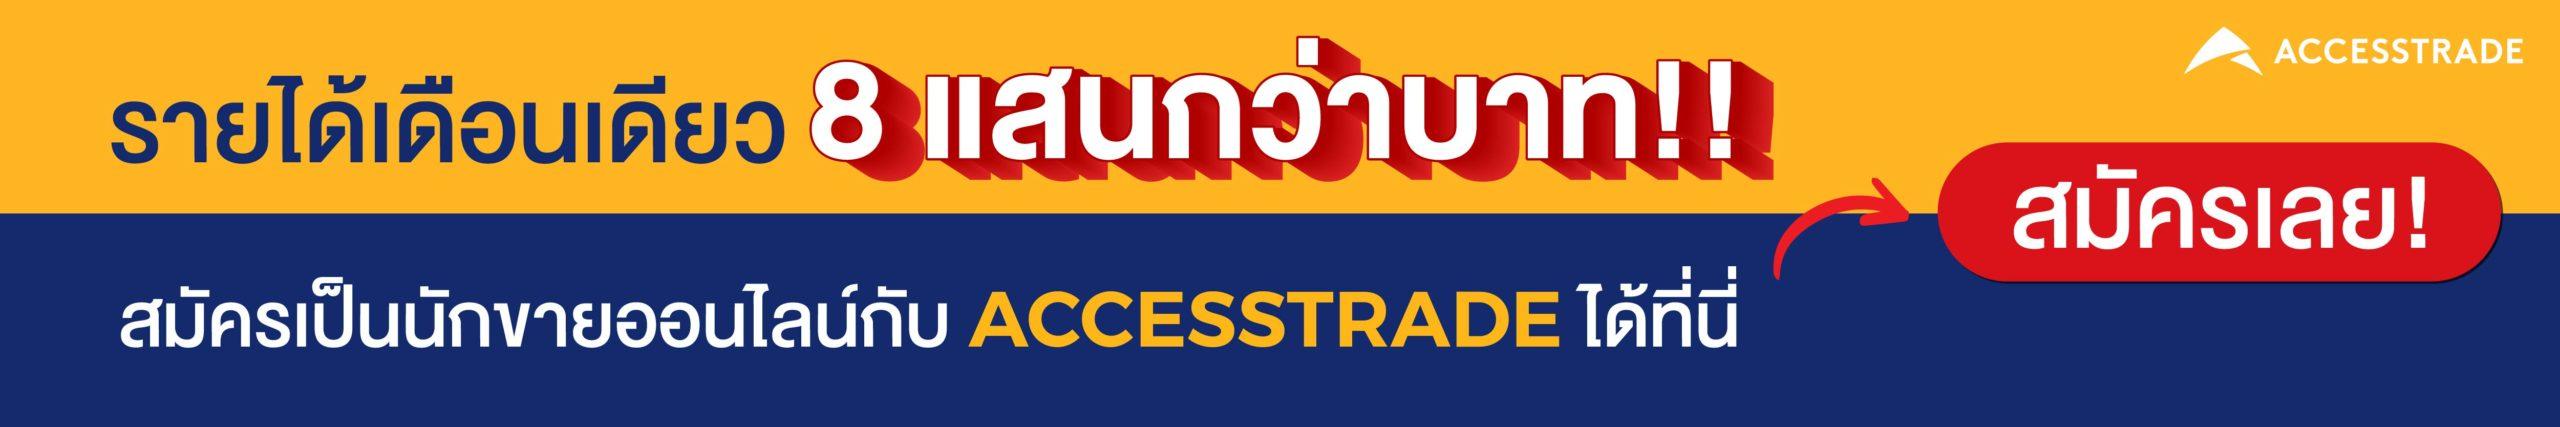 Affiliate ประเทศไทย รับเงินเป็นแสนต่อเดือน